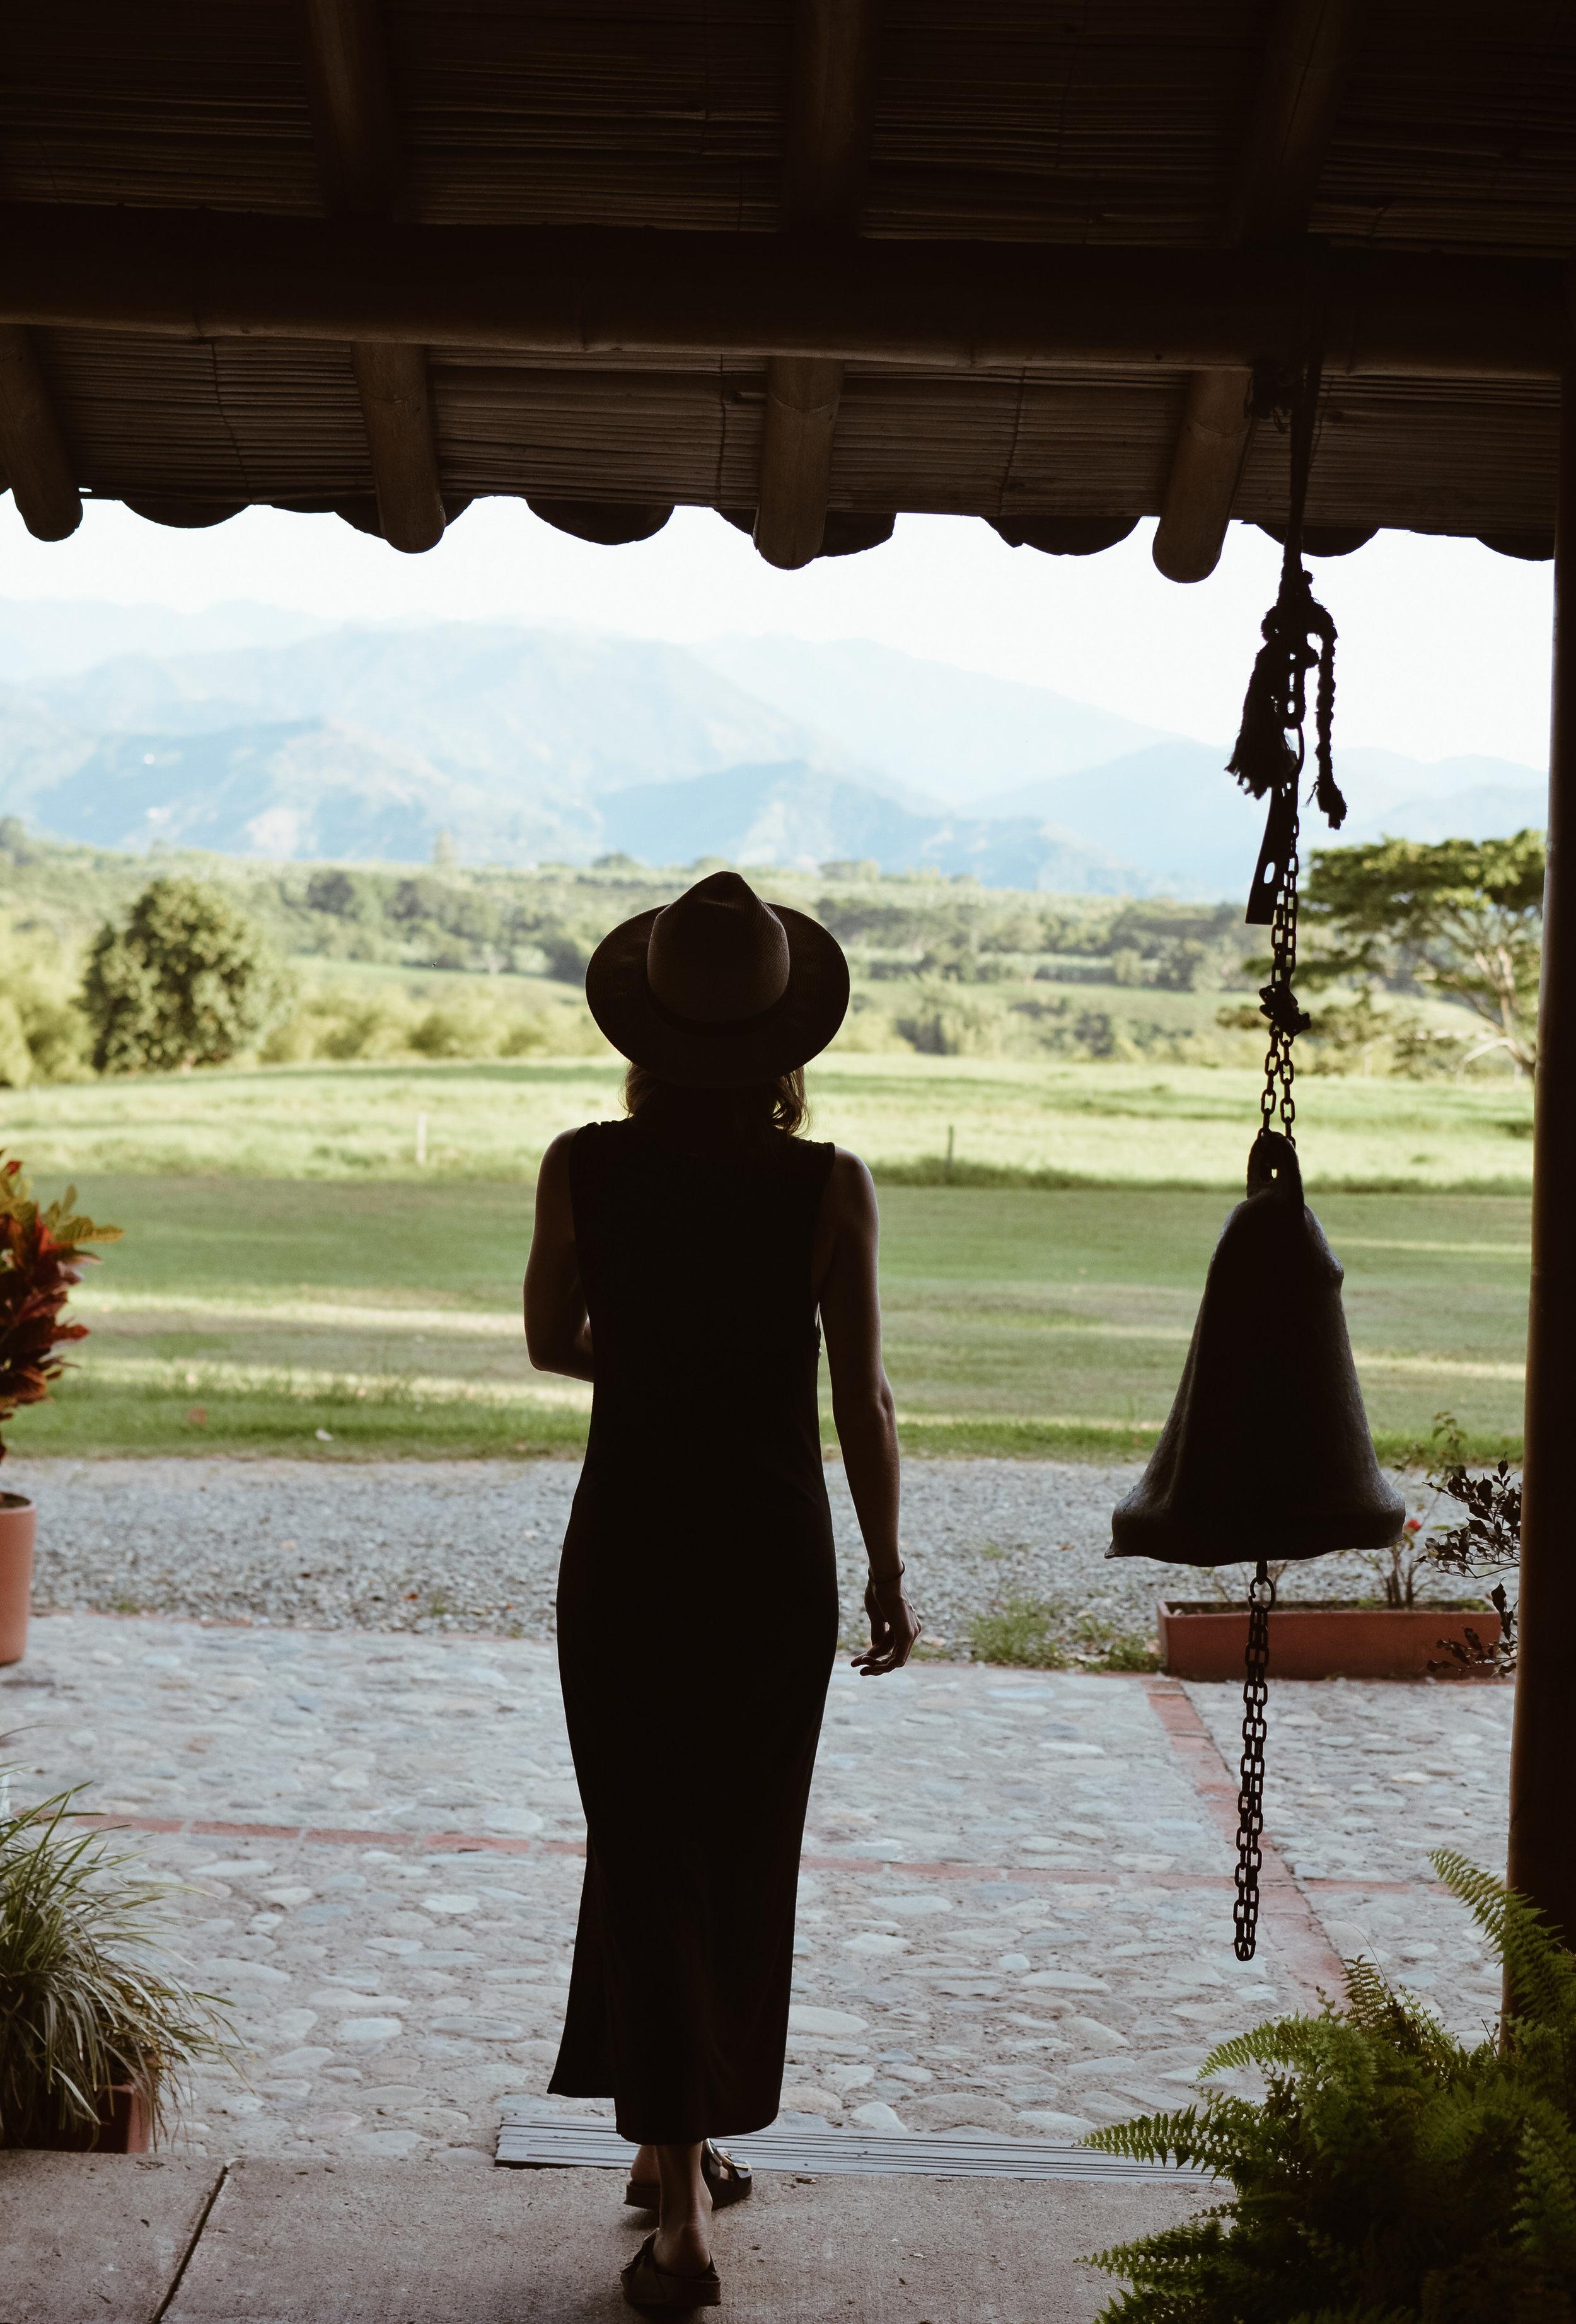 Hacienda+Bambusa+Coffee+Farm+Colombia_Life_on_Pine_DSC_0293.jpg